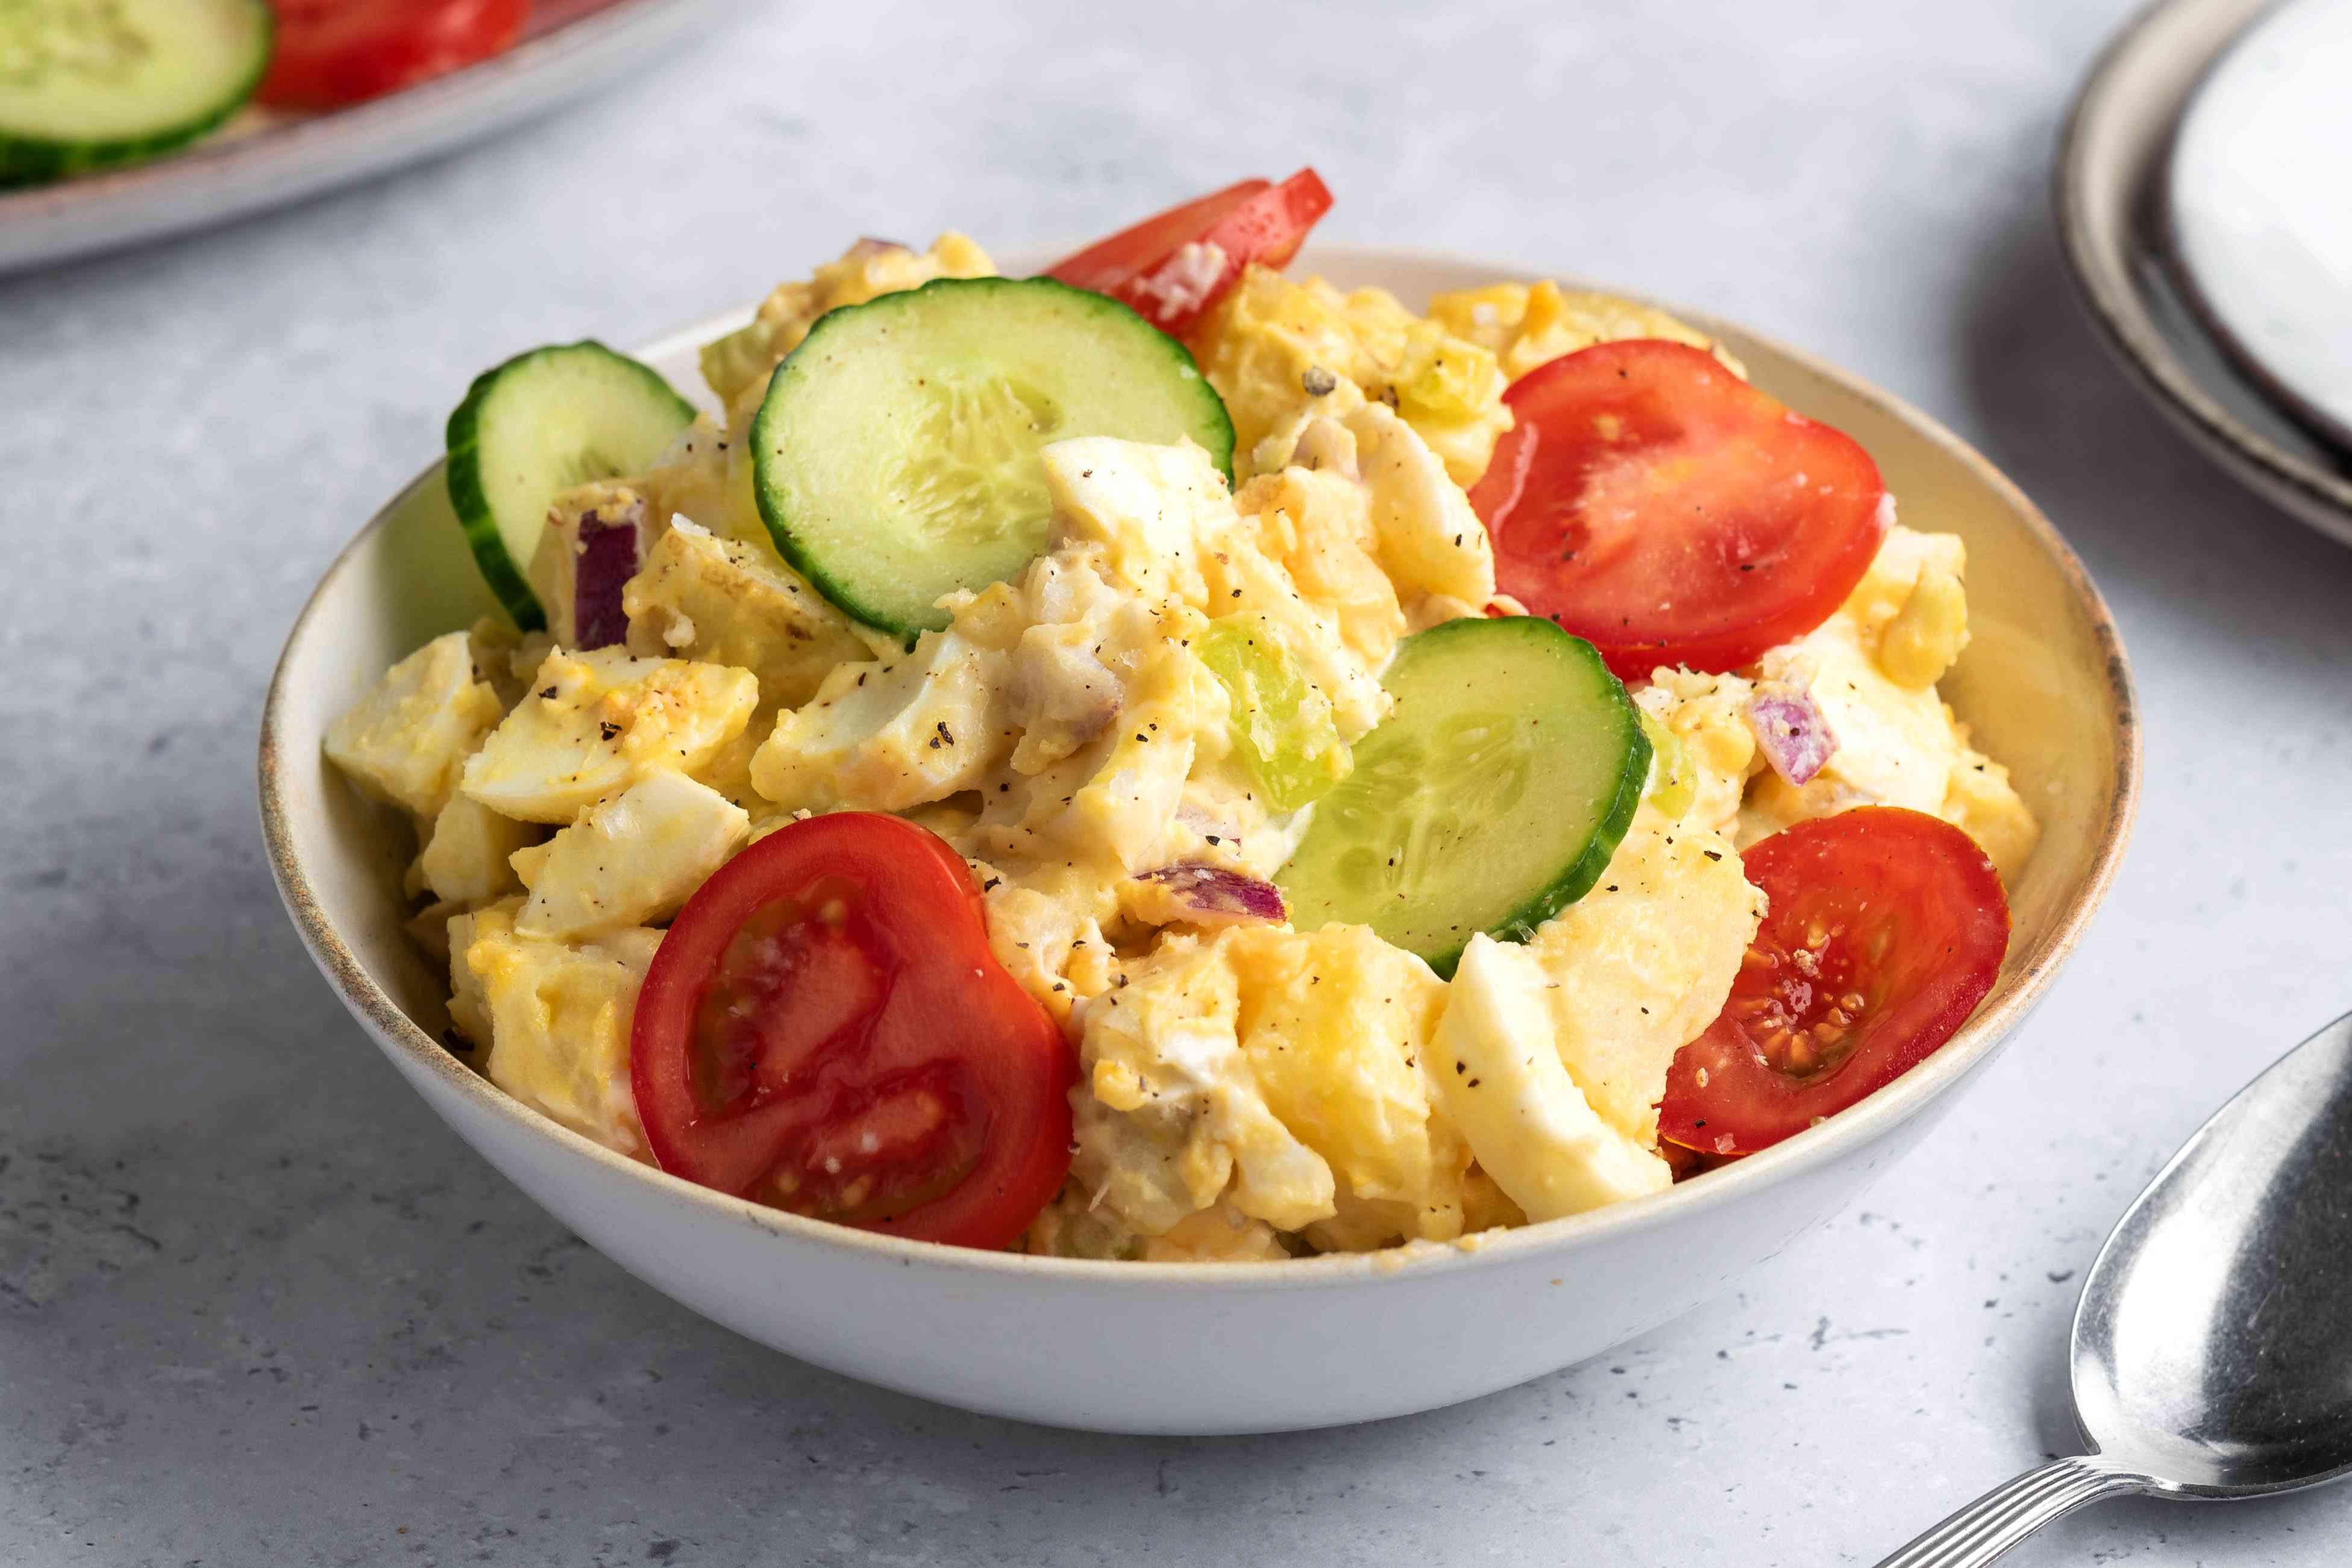 Picnic Potato Salad With Eggs